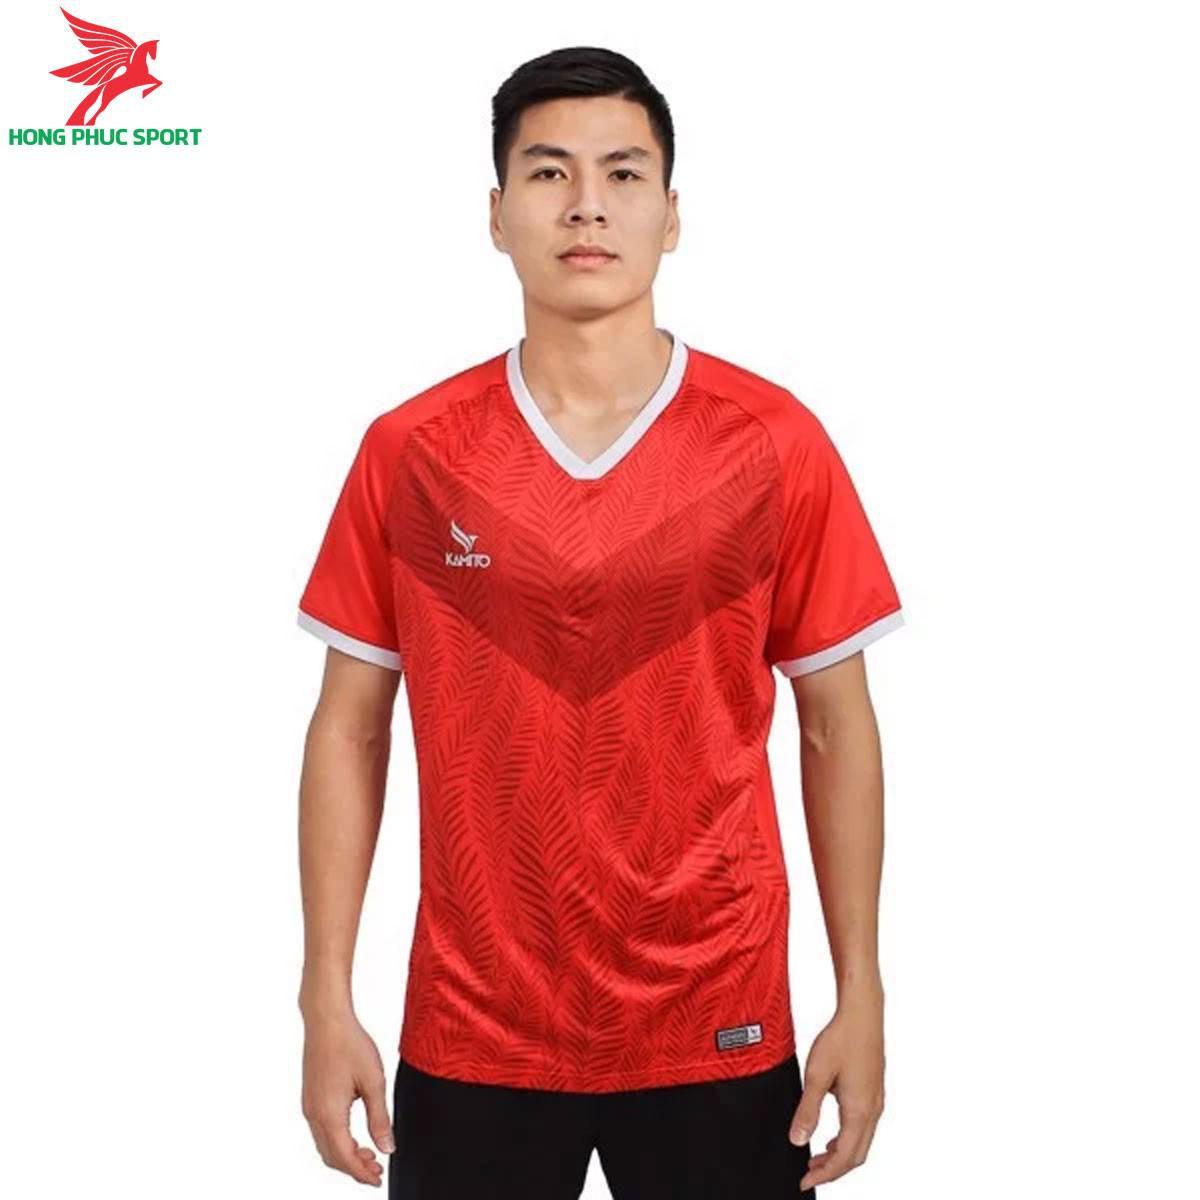 https://cdn.hongphucsport.com/unsafe/s4.shopbay.vn/files/285/ao-khong-logo-kamito-msh2102-mau-do-1-6052dcb021568.jpg